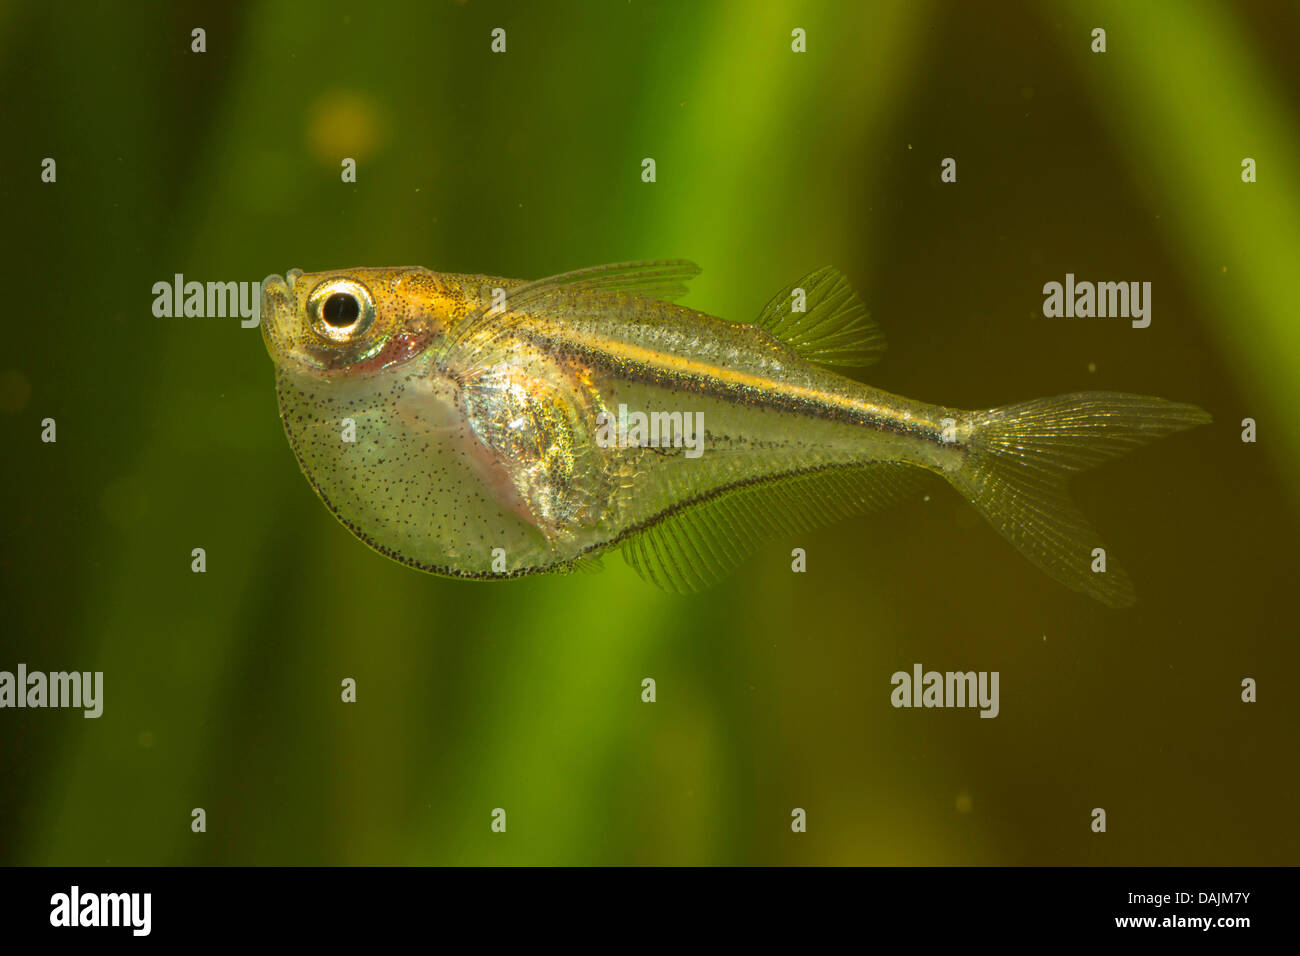 pygmy hatchetfish (Carnegiella myersi), at the water surface - Stock Image